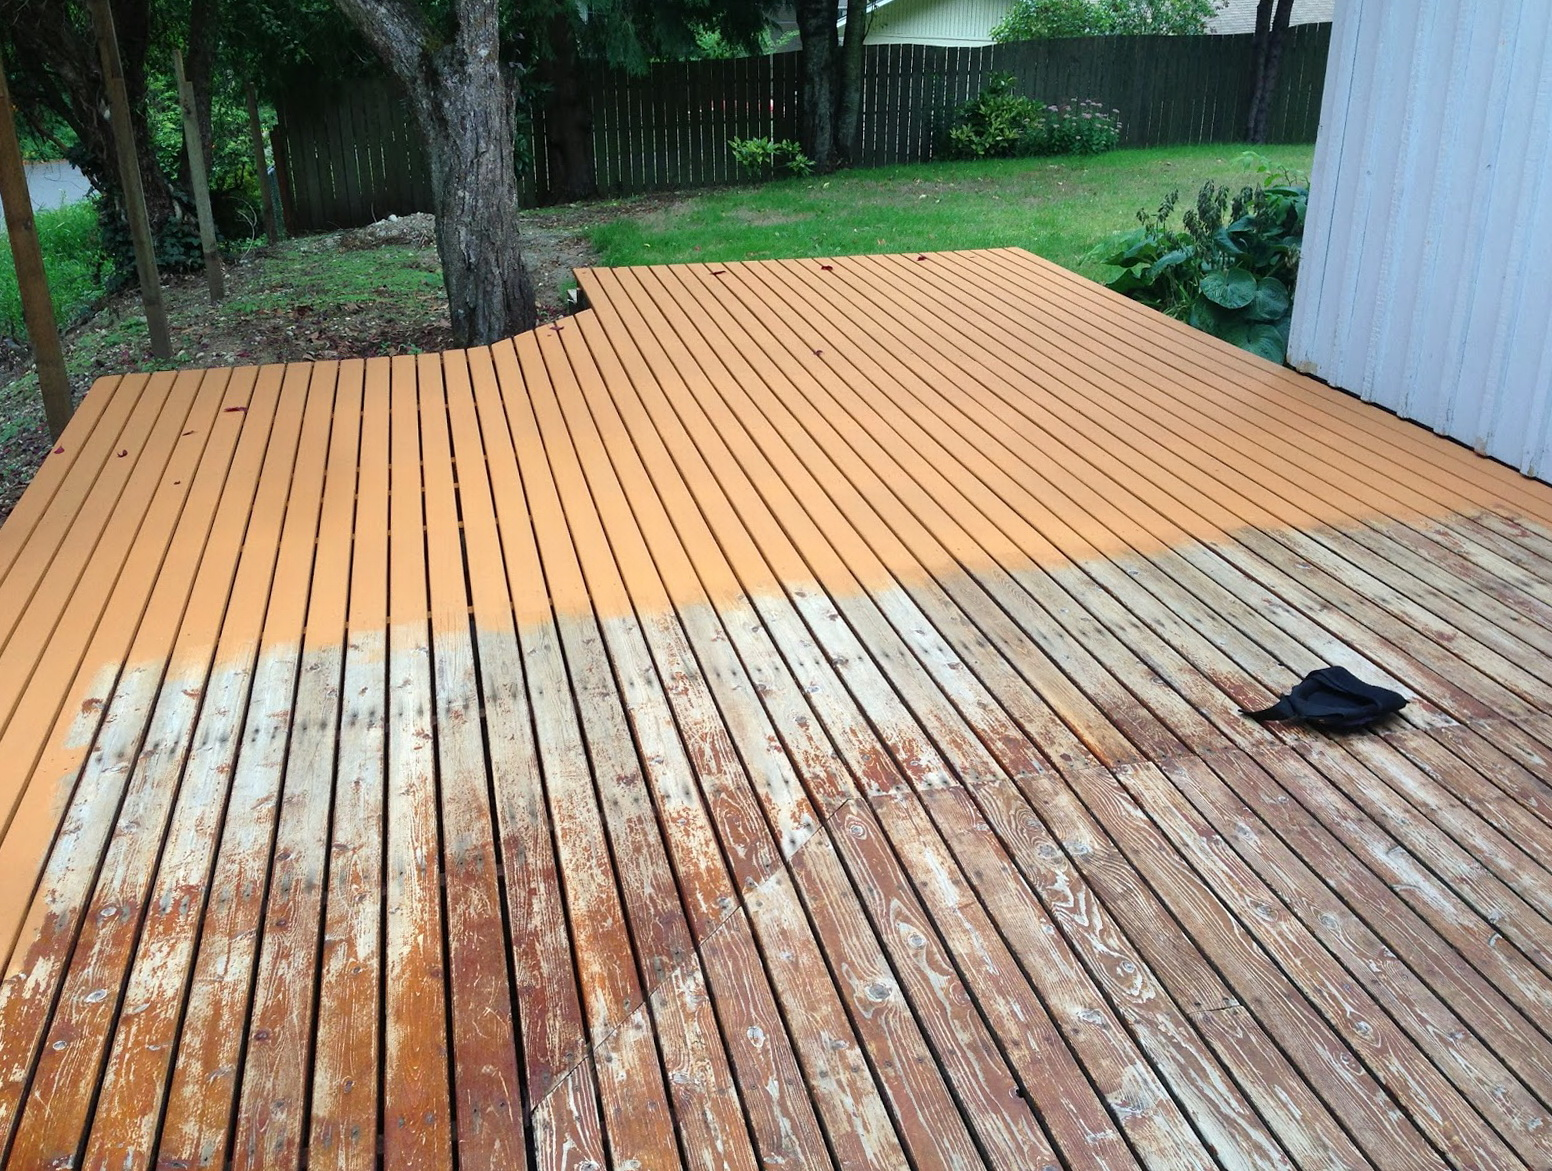 Behr Deck Over Cedar